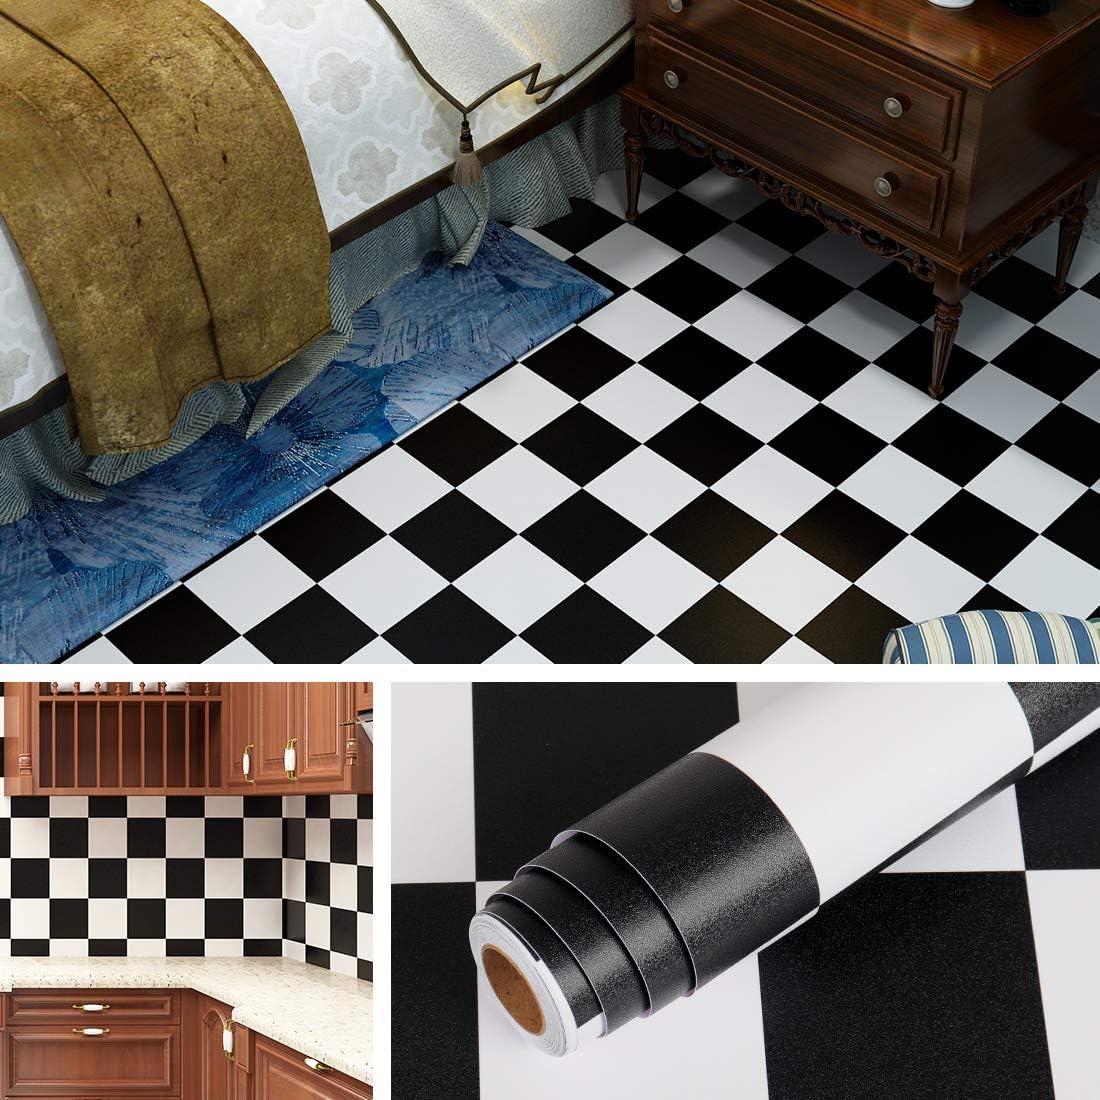 Livelynine Checkered Black and White Vinyl Flooring Roll 9.9x79.9 in  Waterproof Peel and Stick Floor Tile for Bedroom Kitchen Backsplash  Bathroom ...